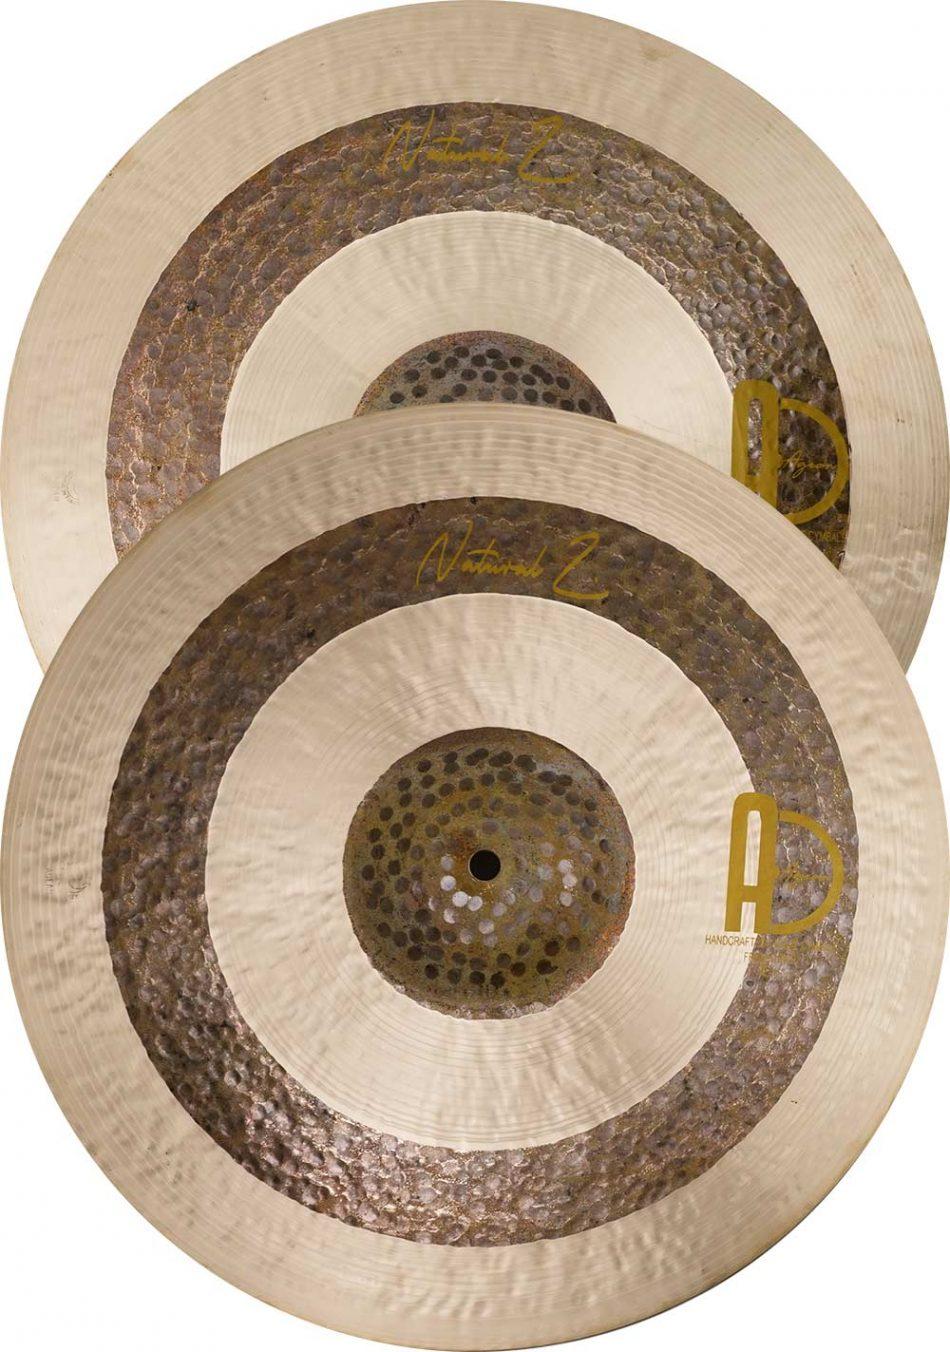 Turkish Cymbals Z Hi Hat 4 950x1352 - Z Hi-Hat Cymbals Z